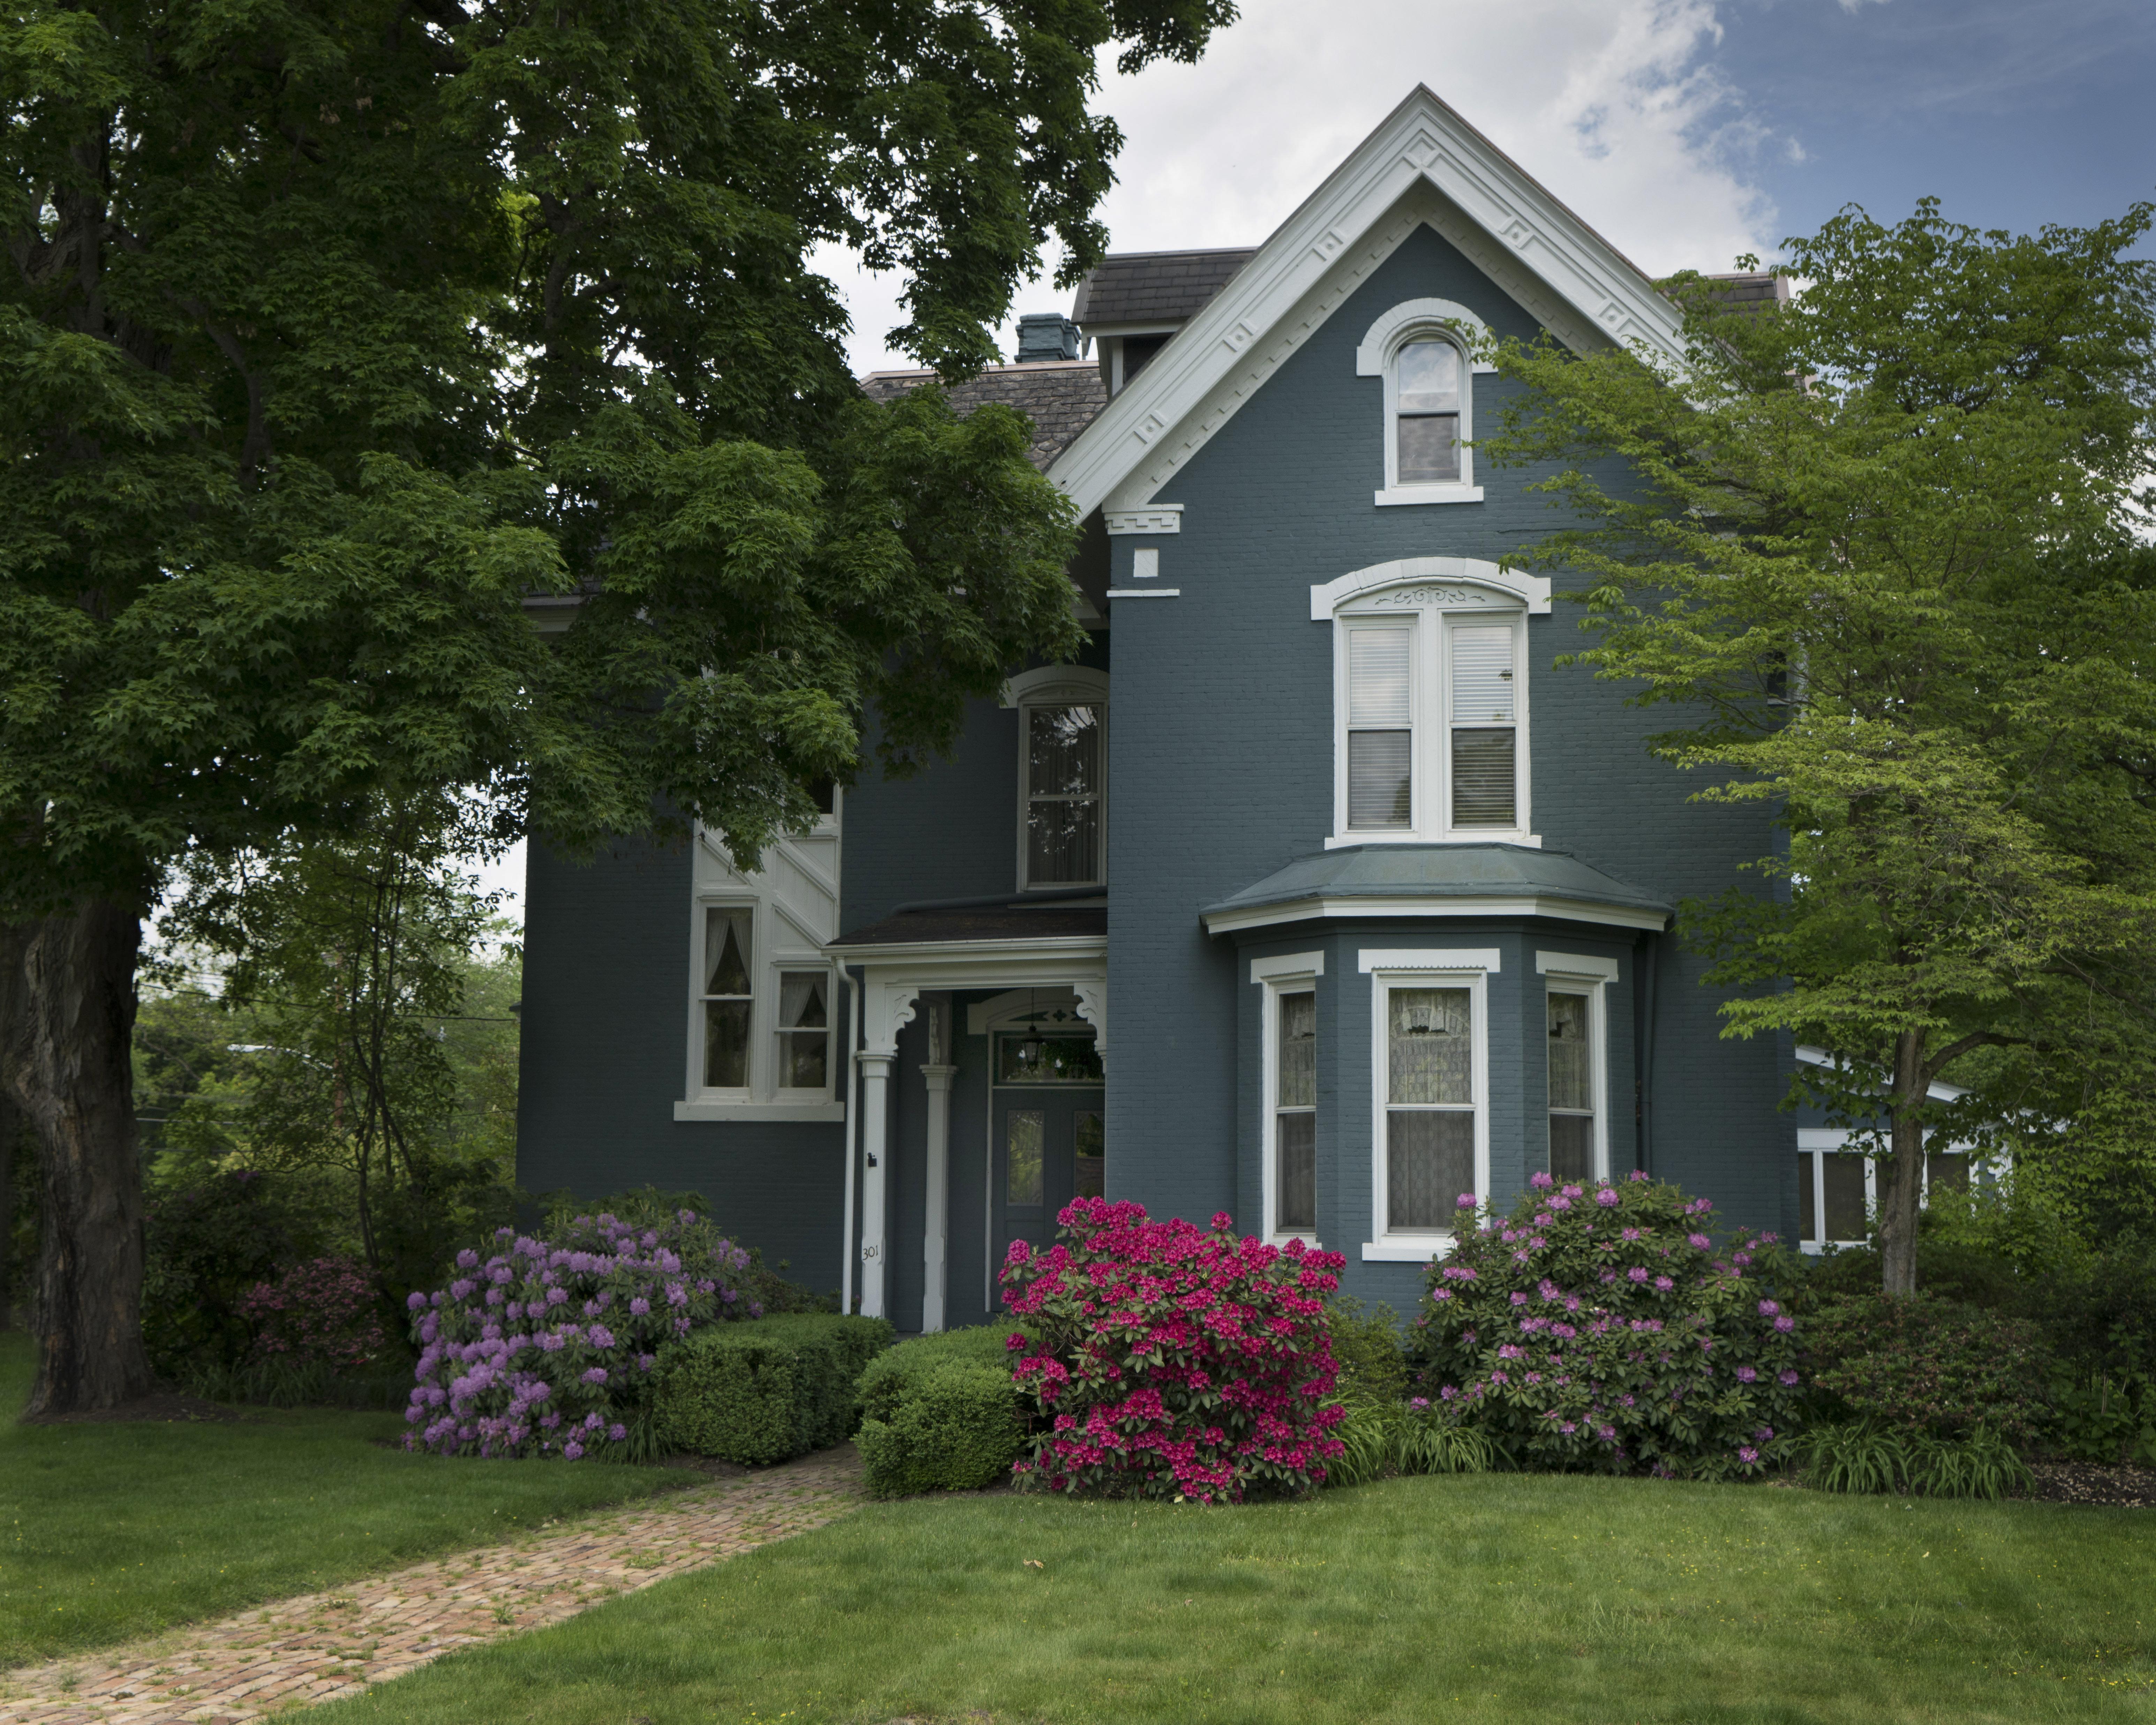 #house, #spring, #rhododendron, #rhody, #victorian, #pennsylvania, #sewickley